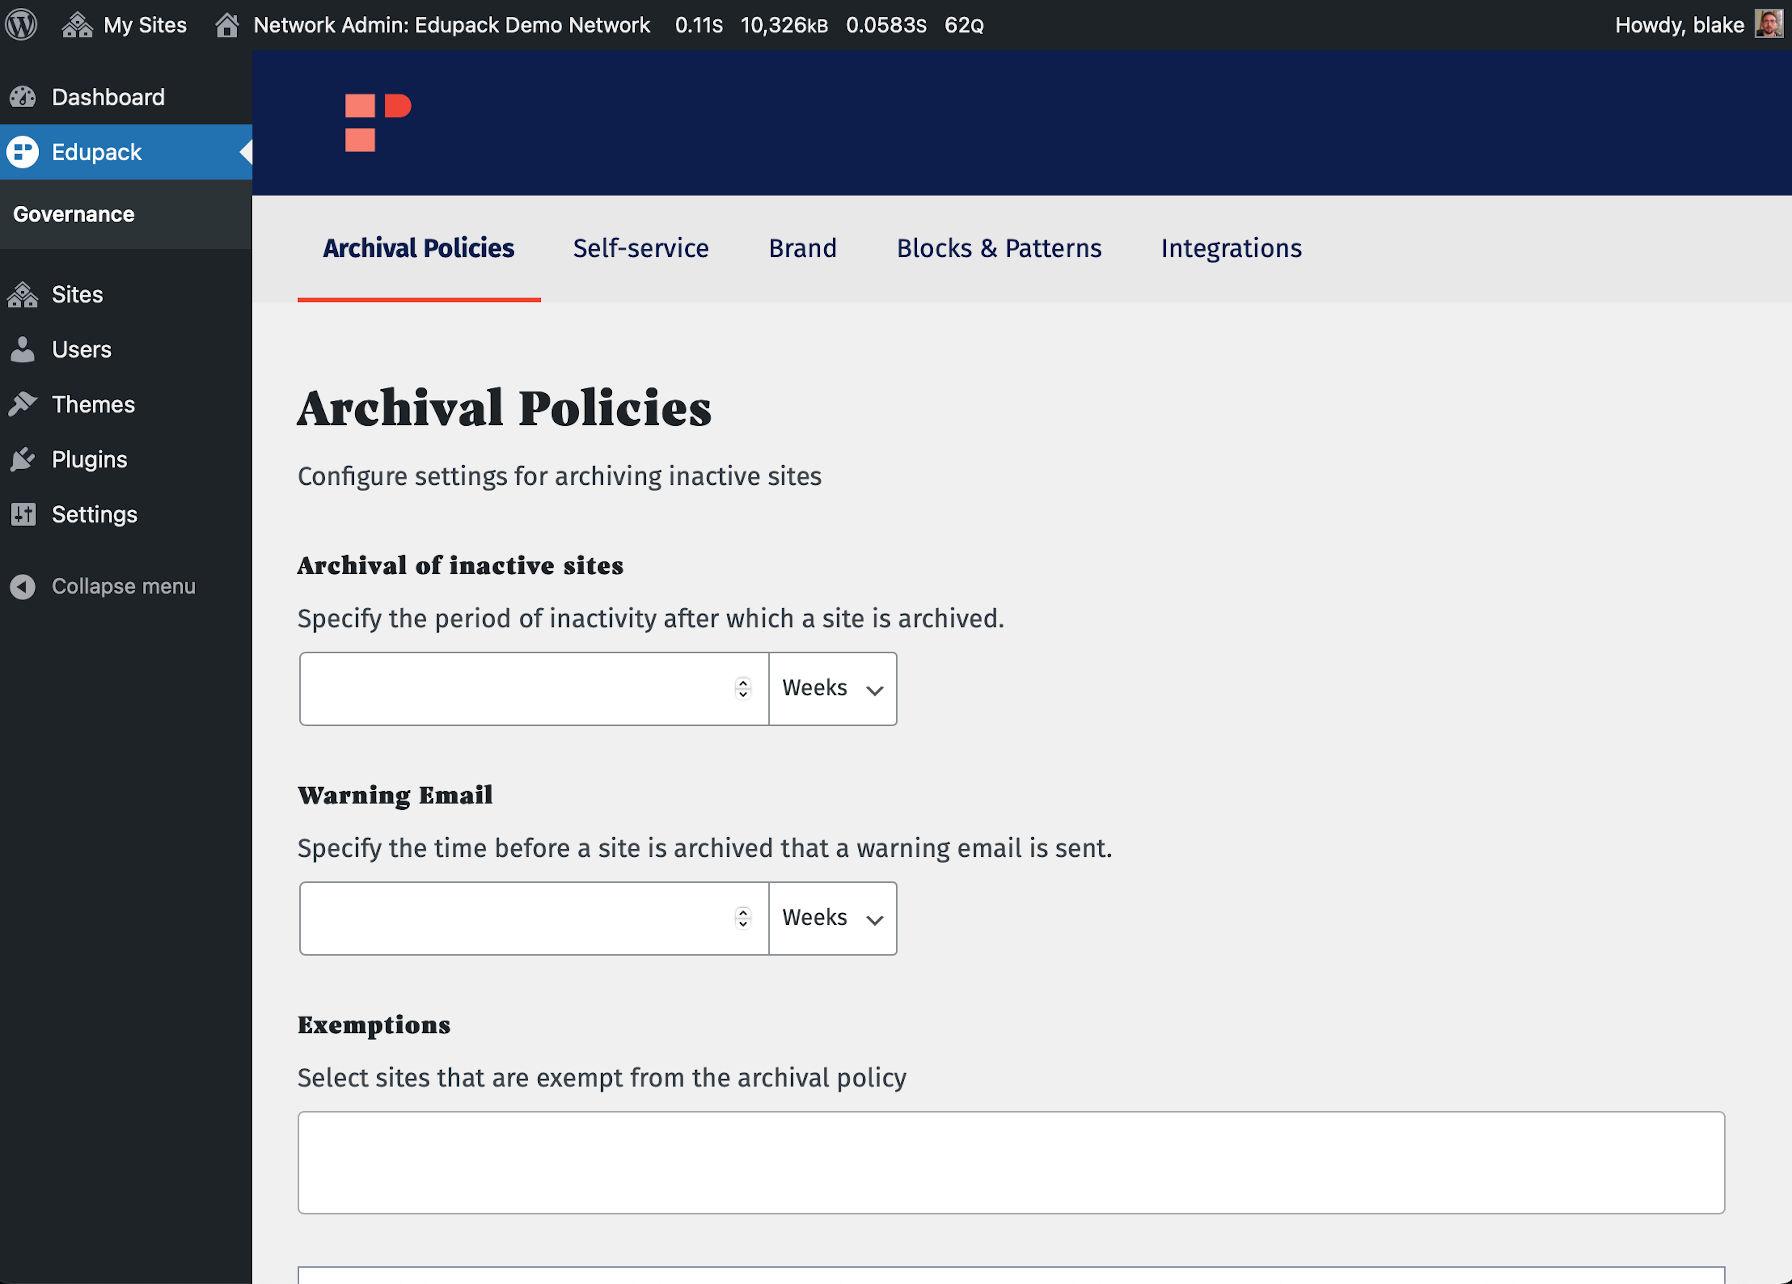 Archiving settings screen for Edupack.